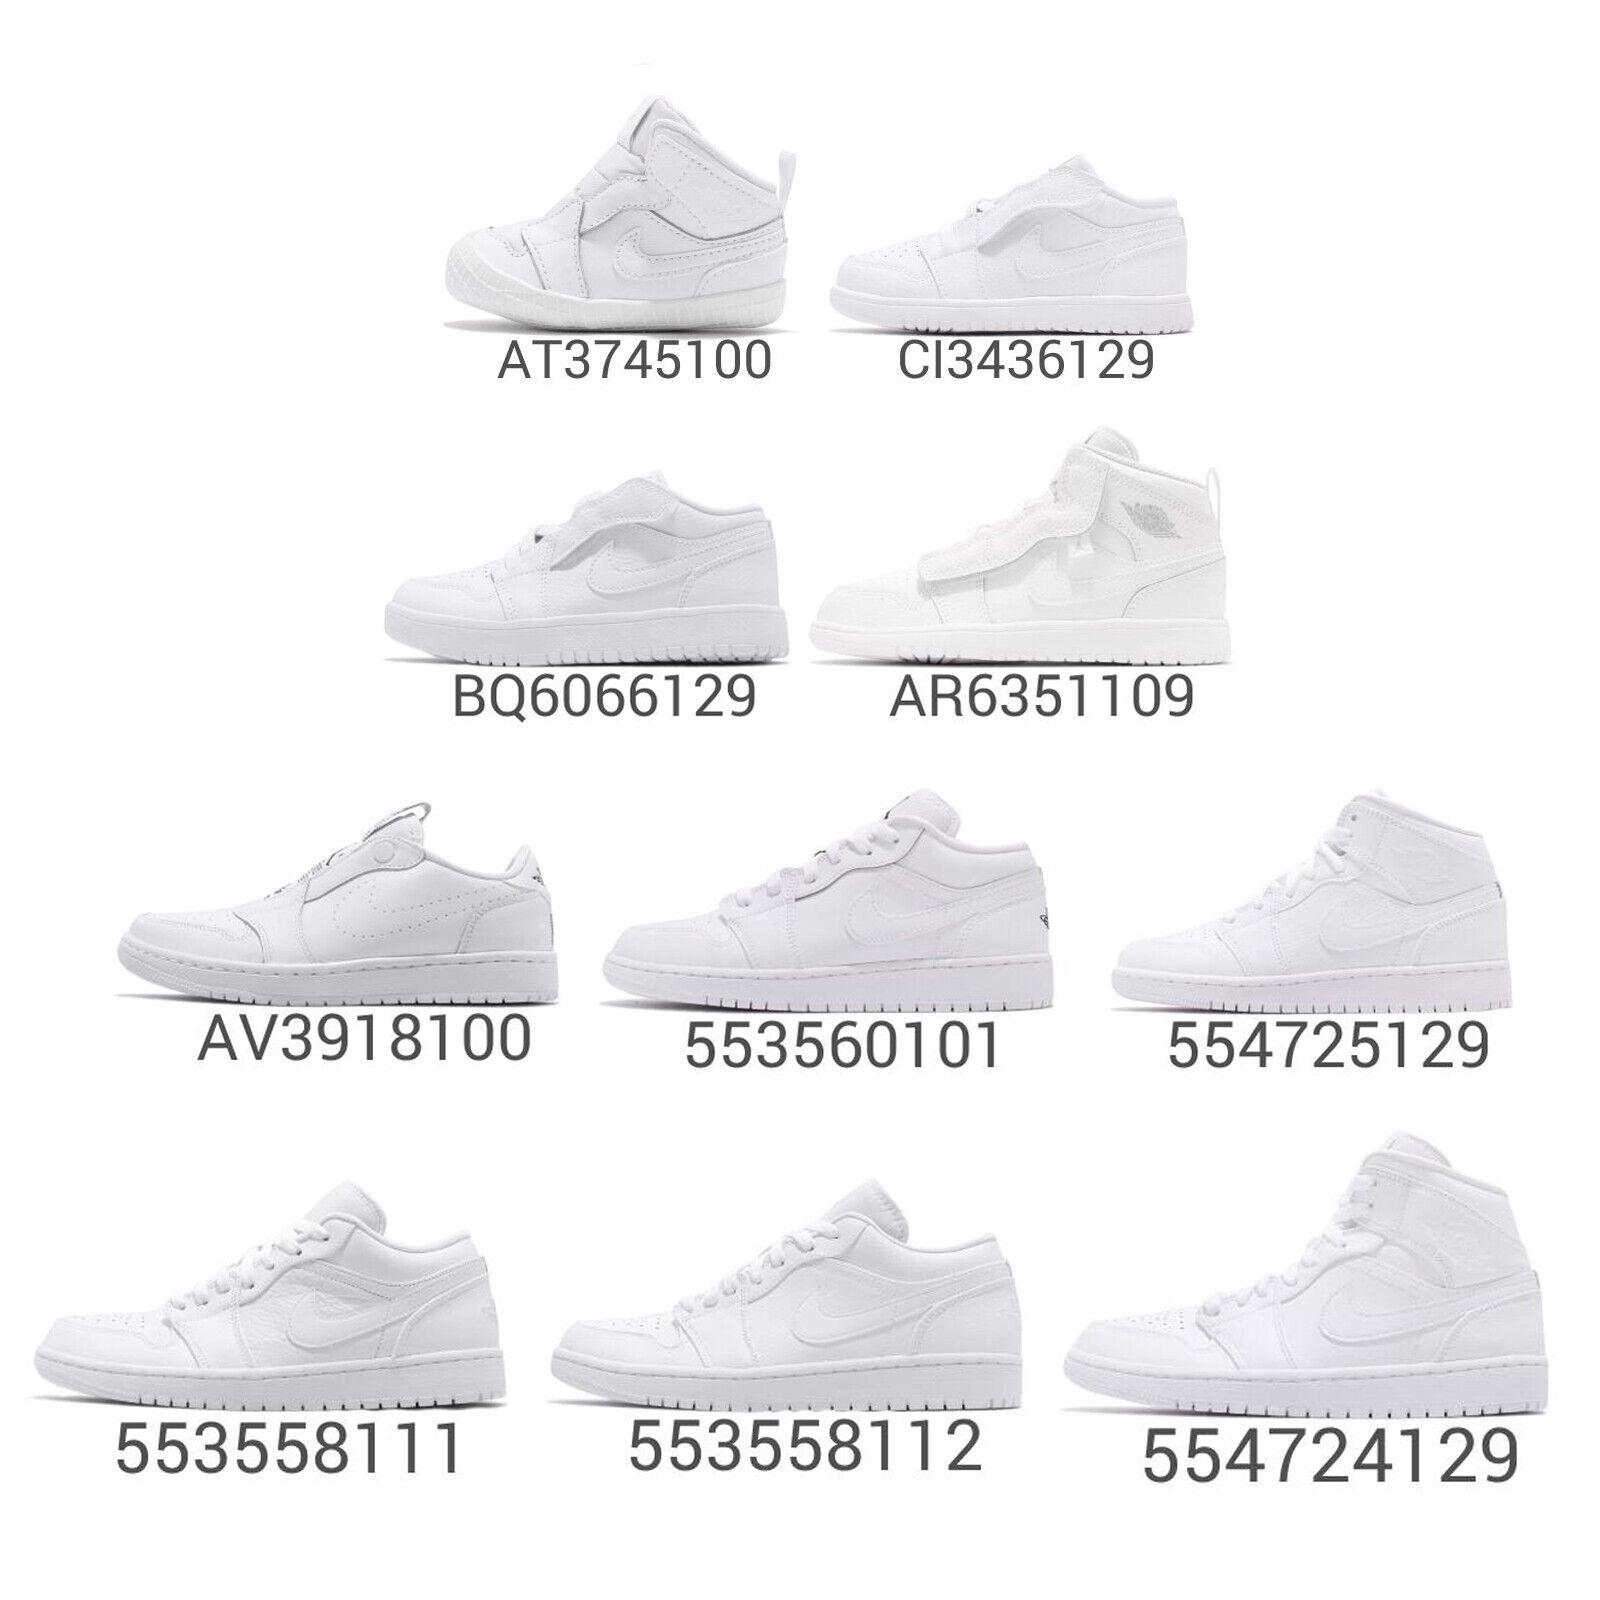 best website 76380 8ed53 Nike Air Jordan 1 Low Mid Trible White AJ1 I Men Women Kids Baby TD Shoes  Pick 1